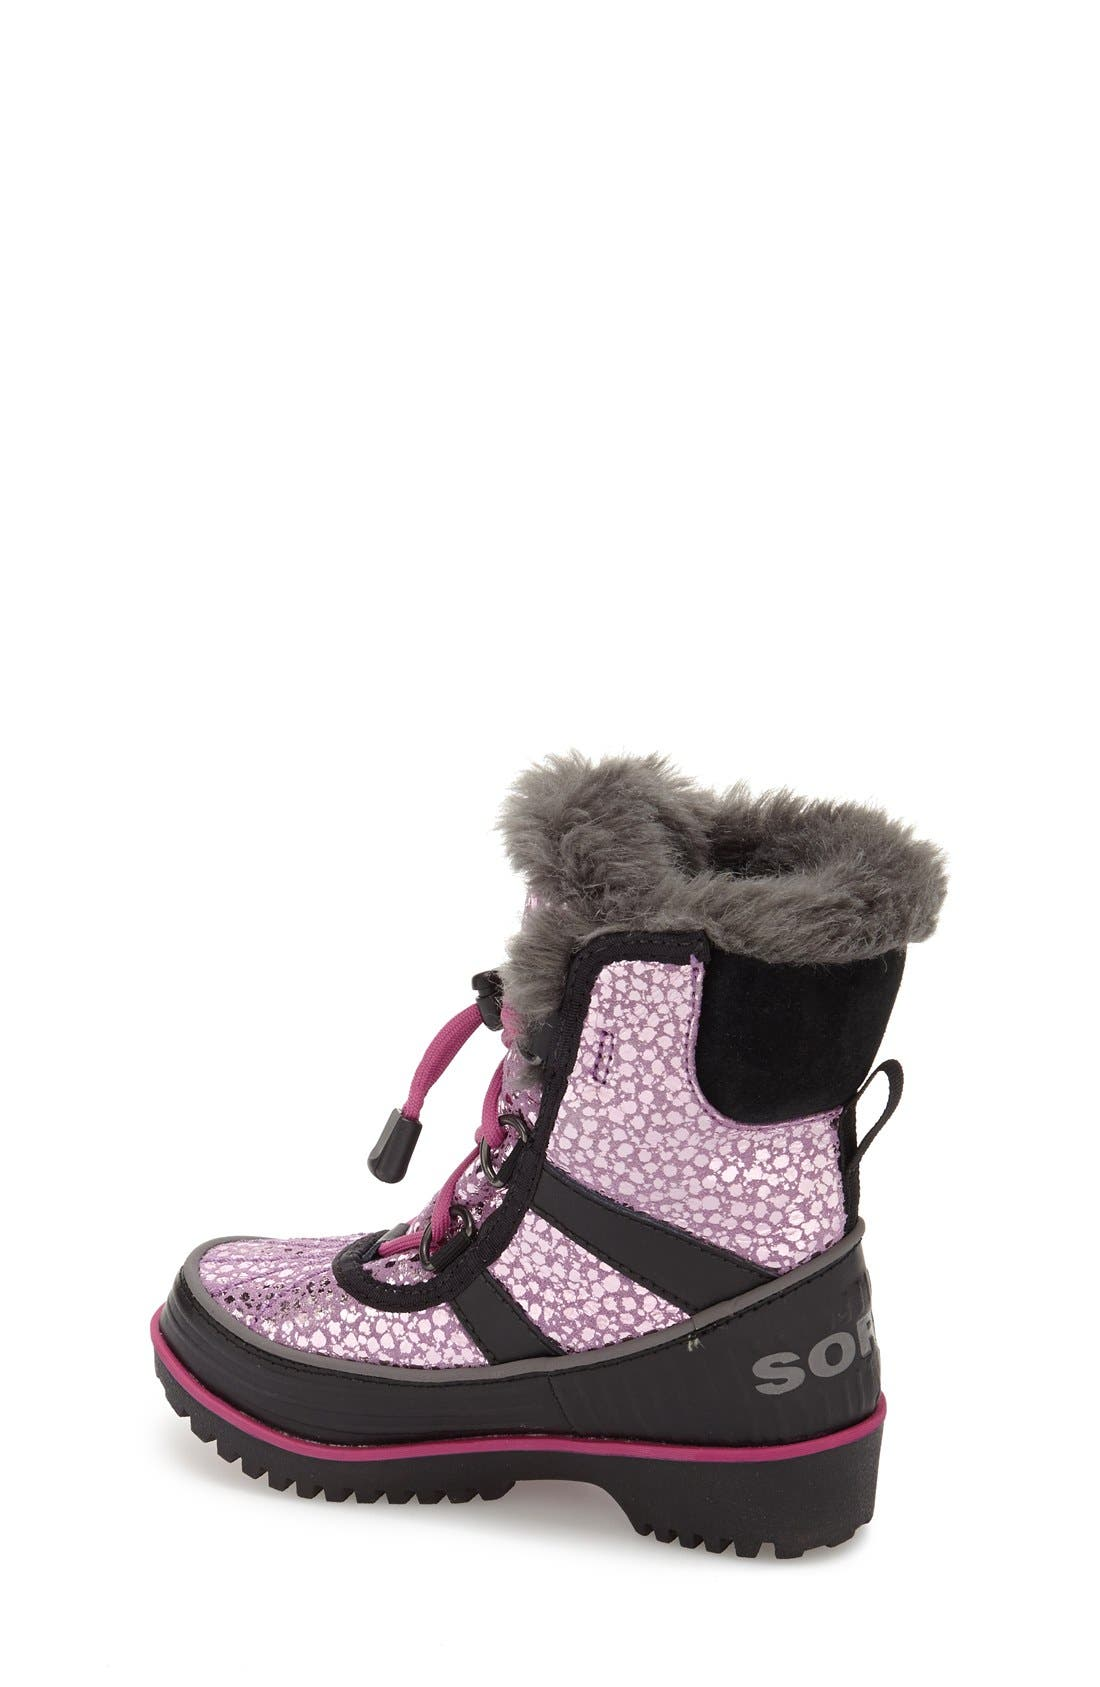 Alternate Image 2  - SOREL 'Tivoli II' Waterproof Snow Boot (Toddler & Little Kid)